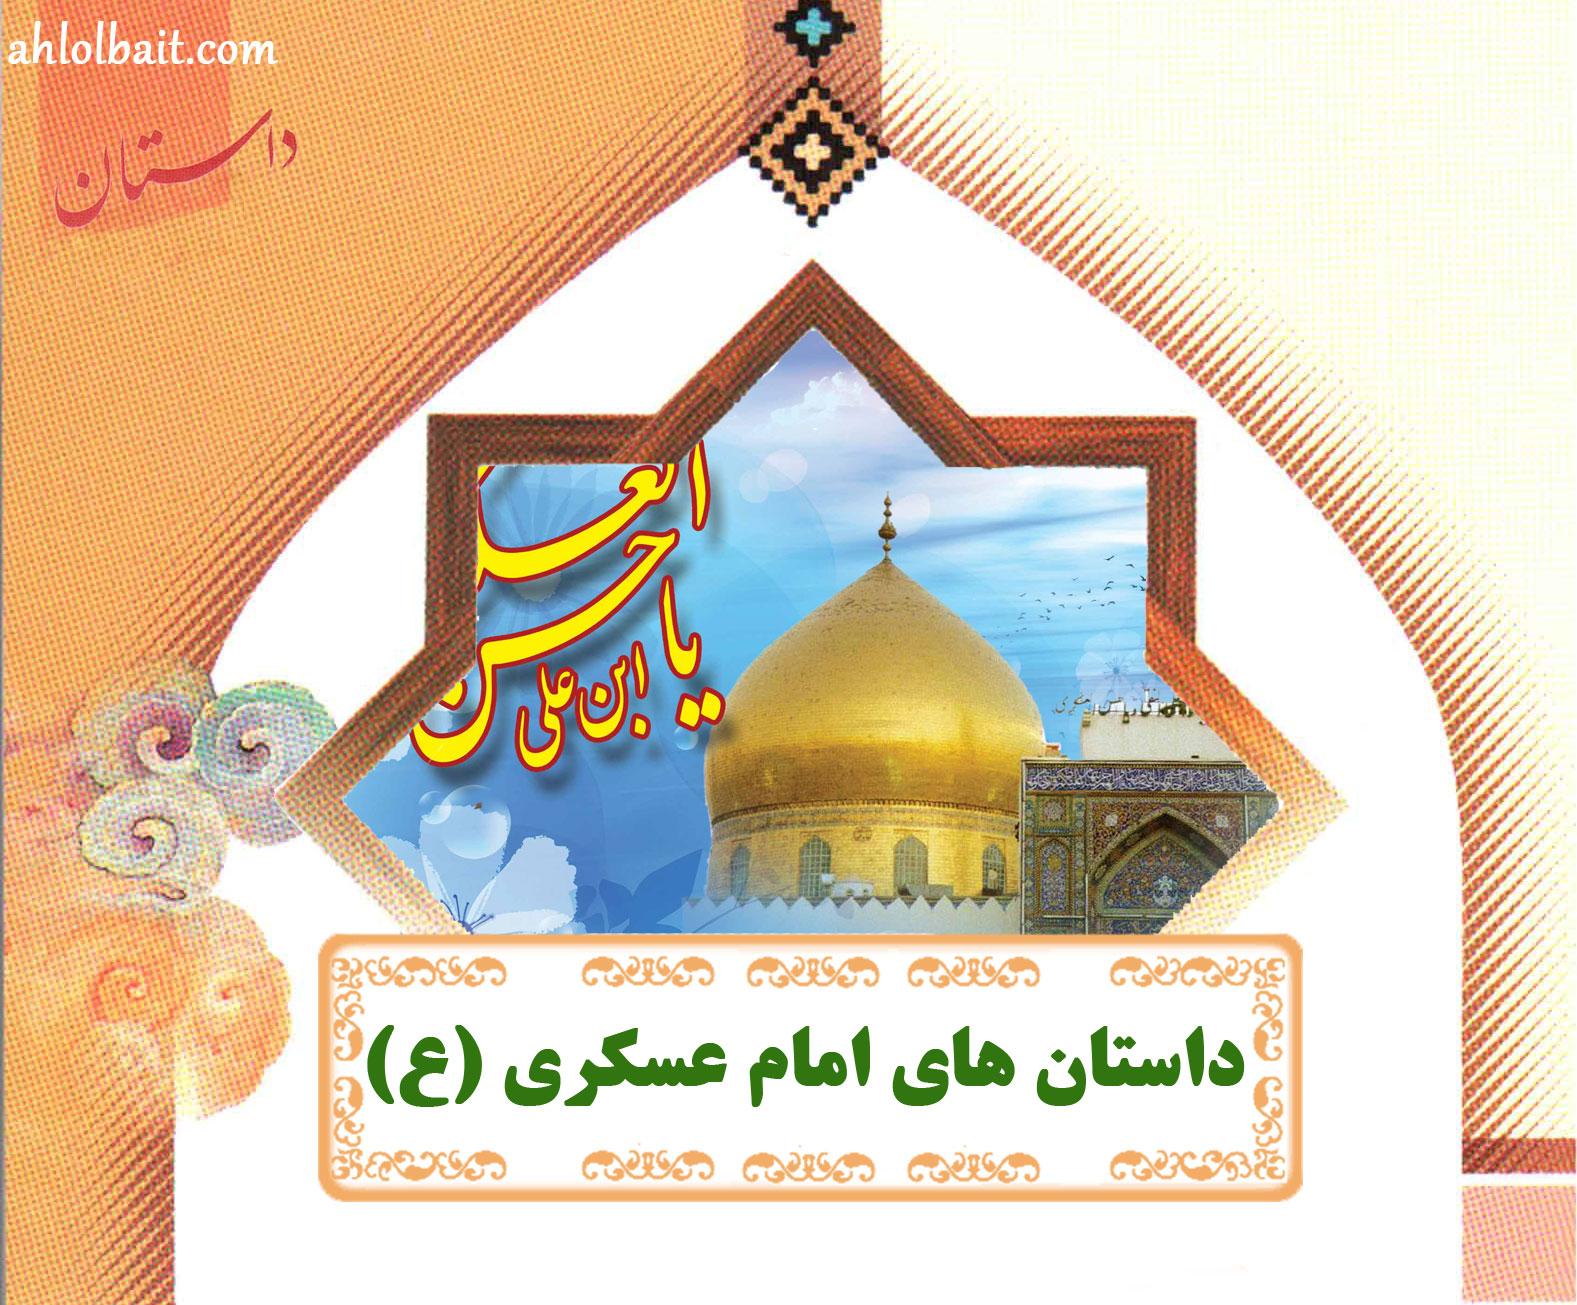 http://ahlolbait.com/files/161/image/dastan-emam-hasan-askari_6.jpg